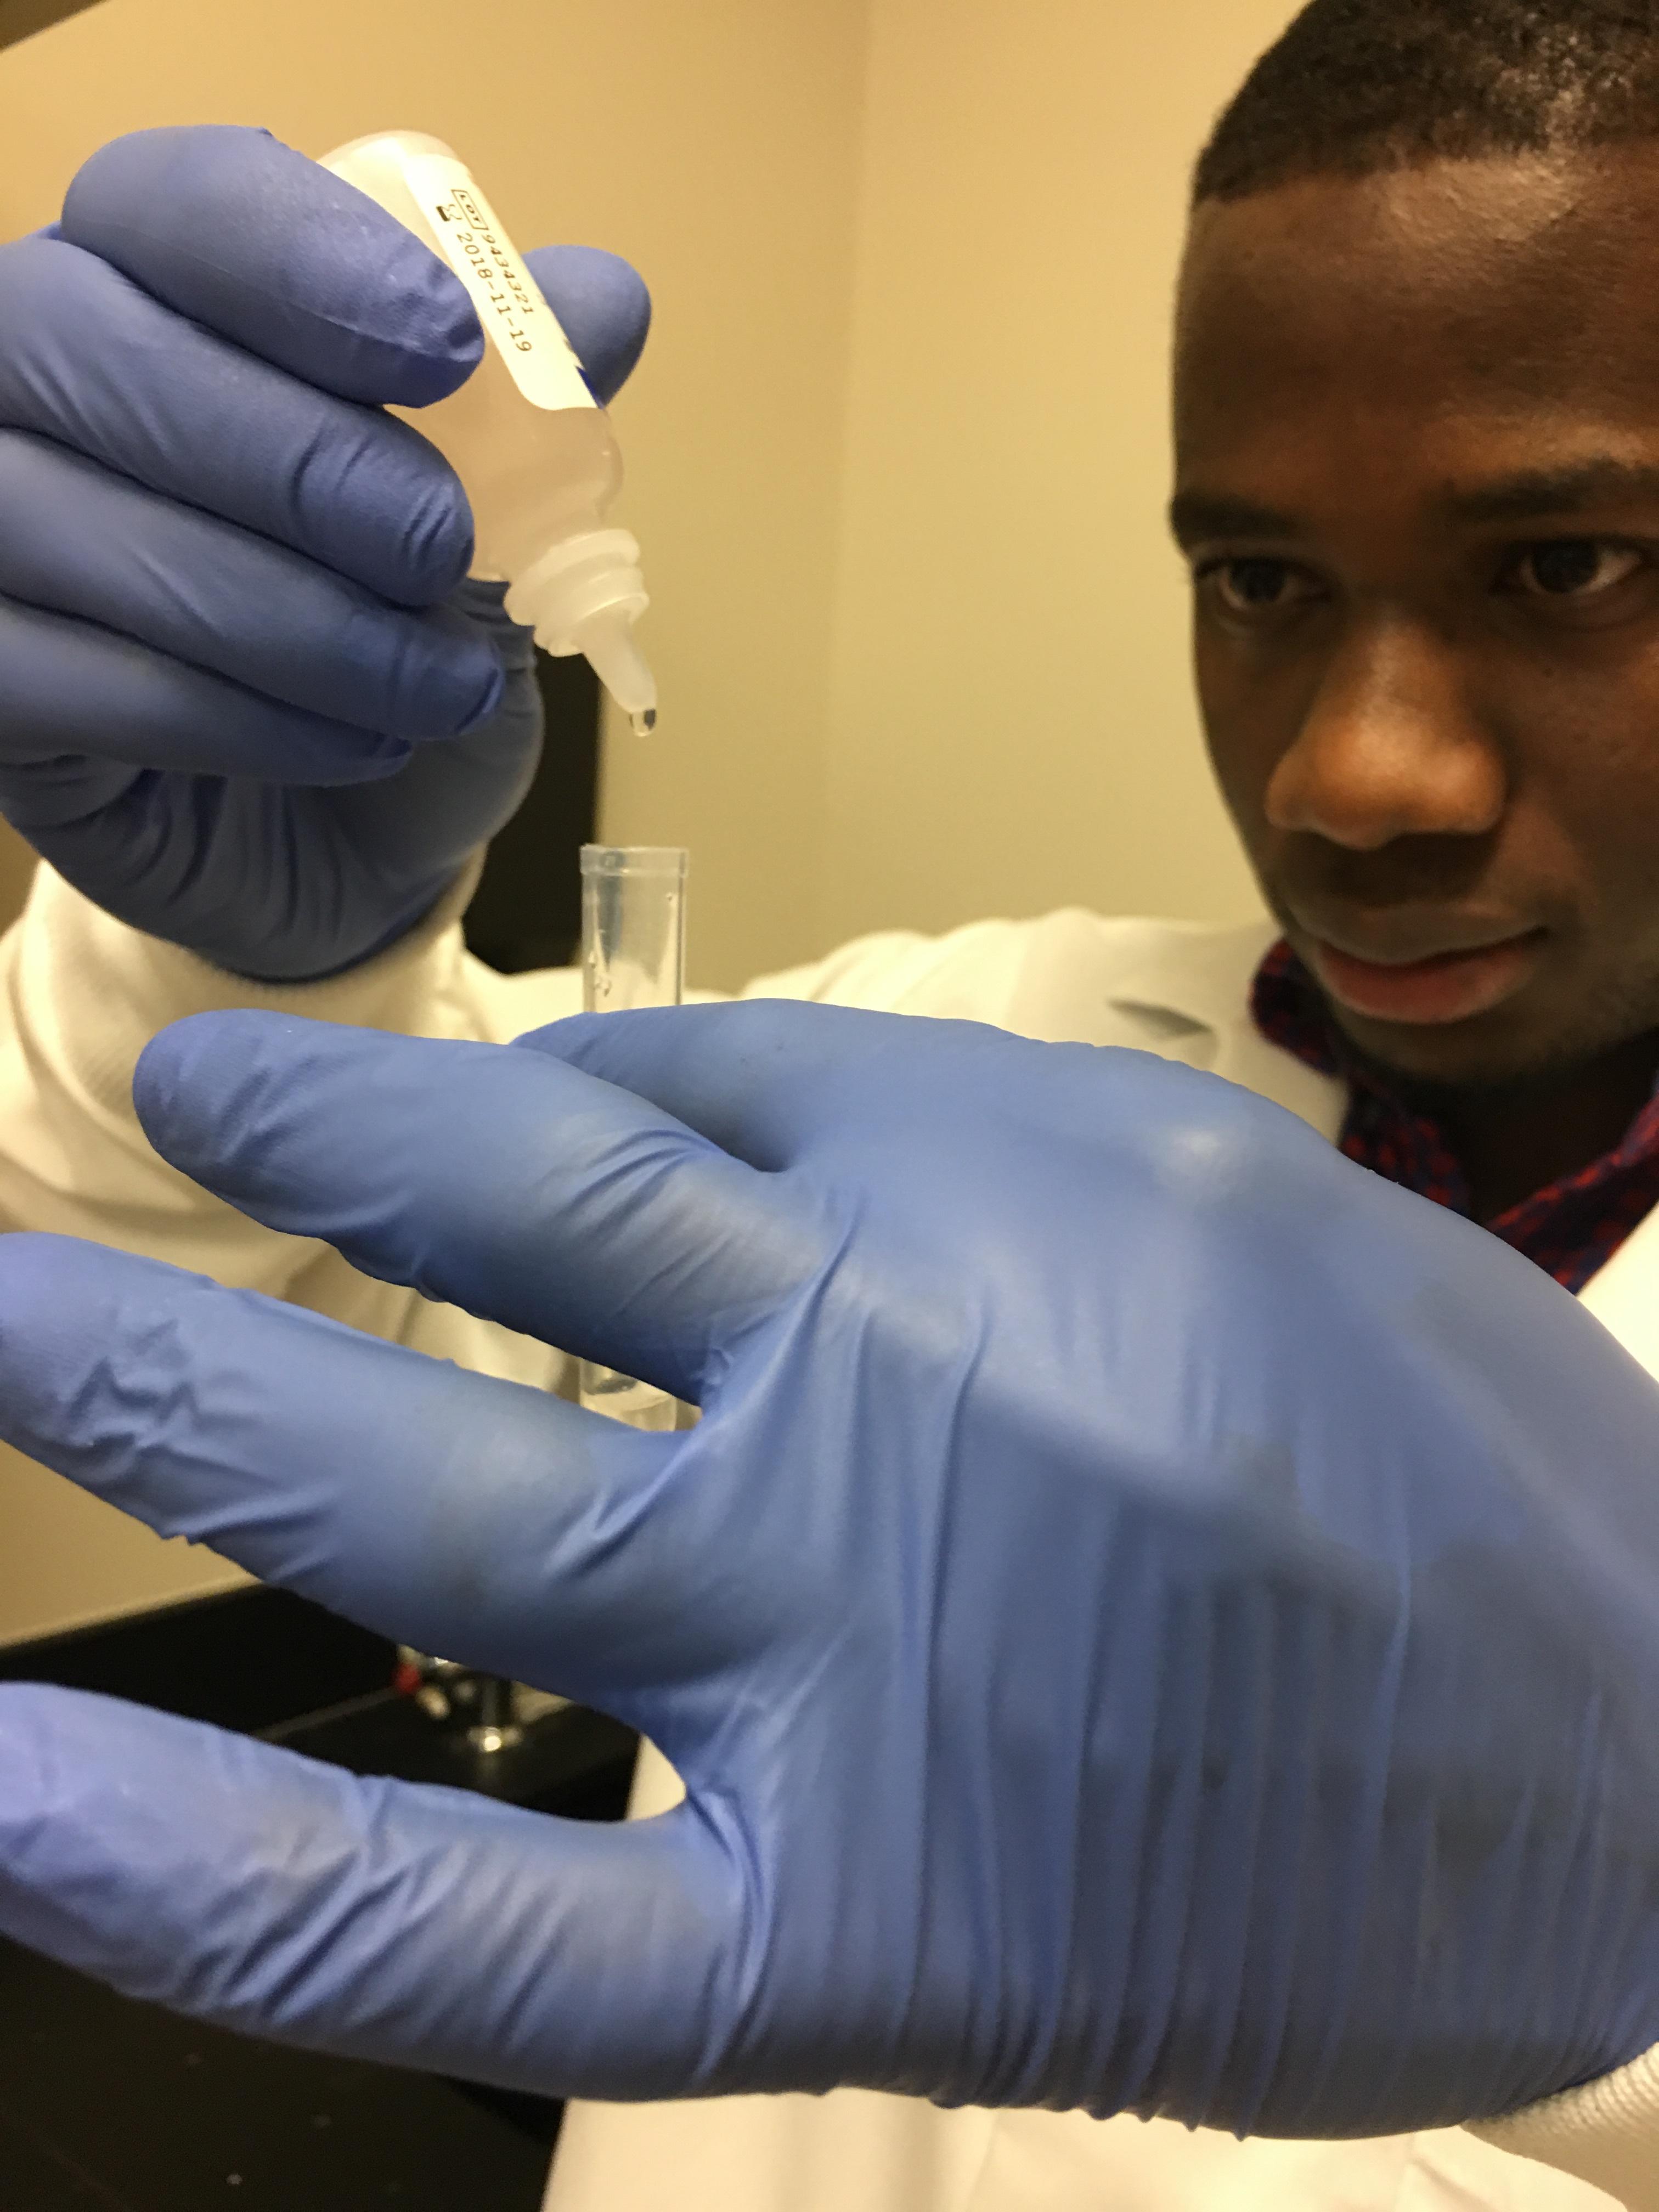 Texas BioMed Explores Malaria in Latest Podcast